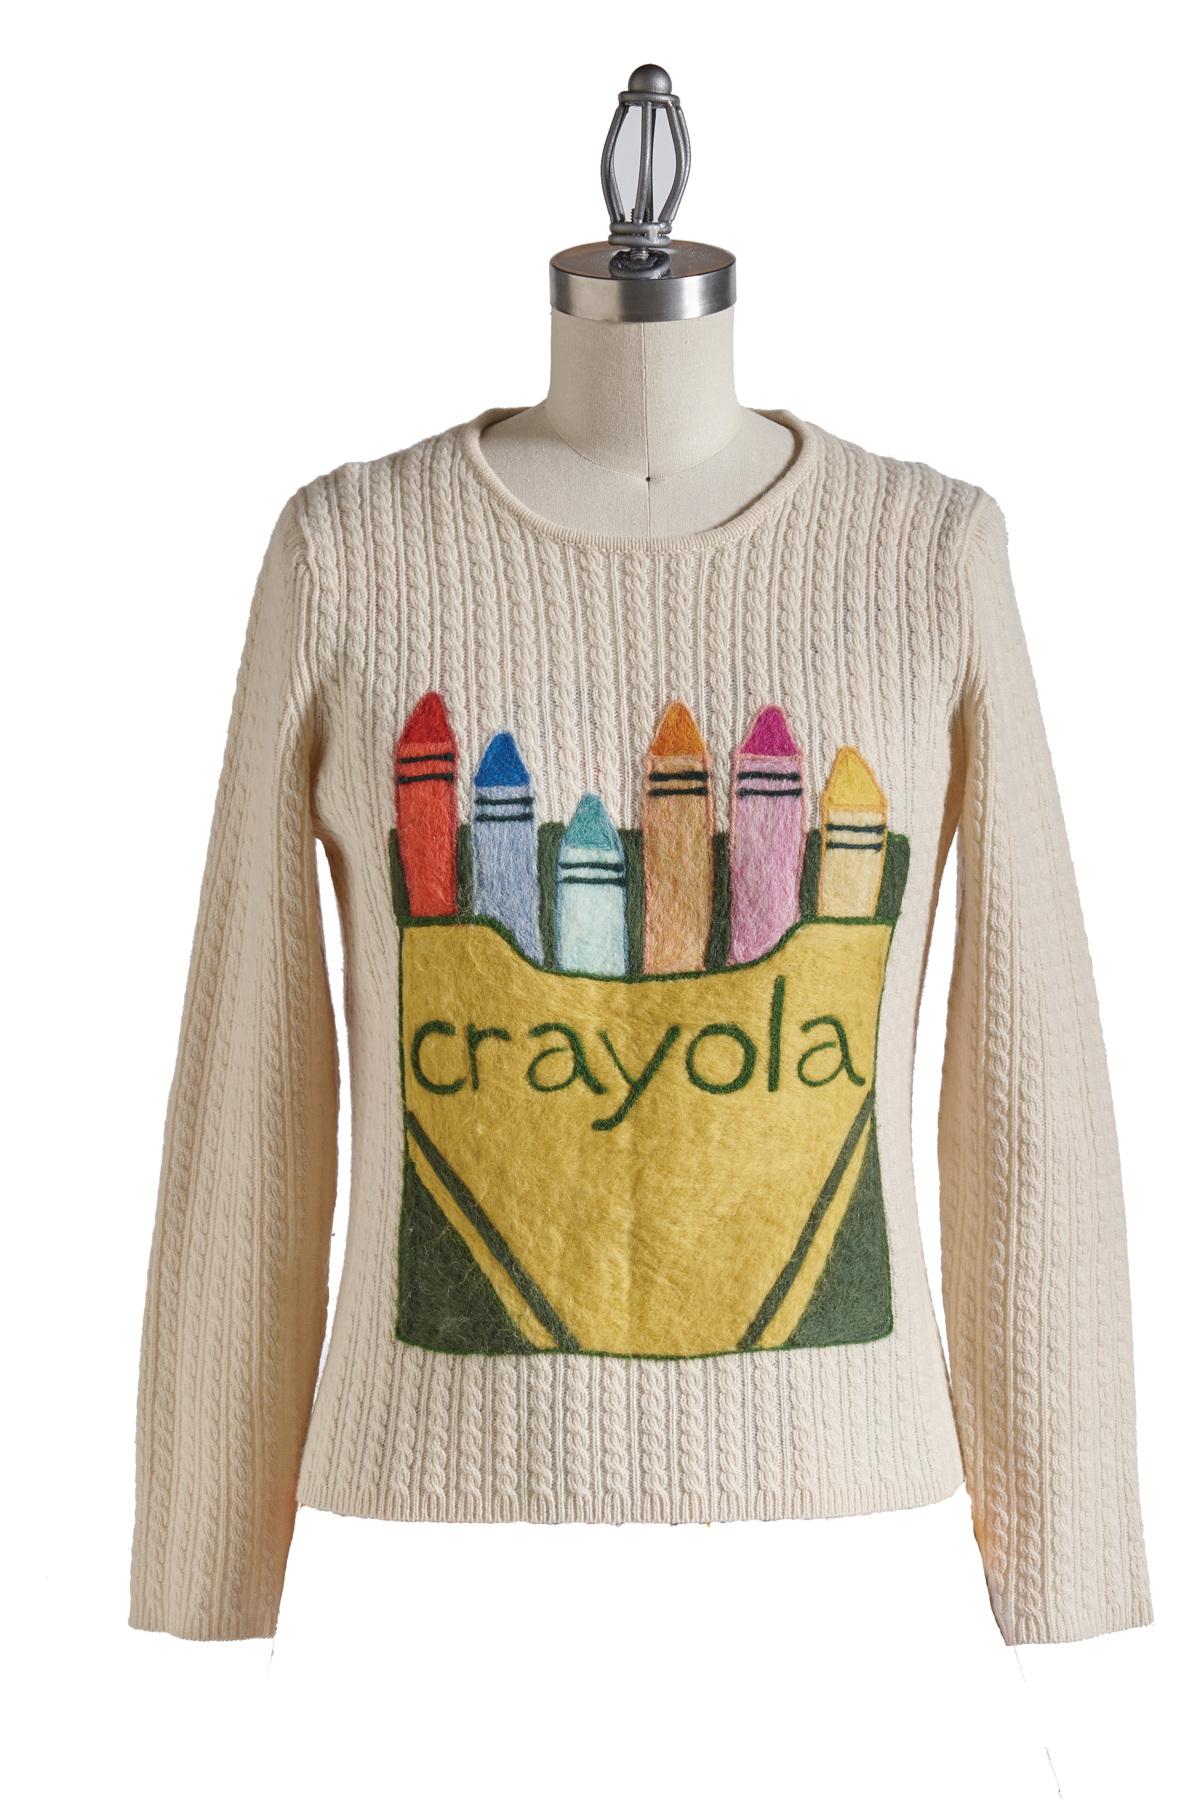 crayola sweater